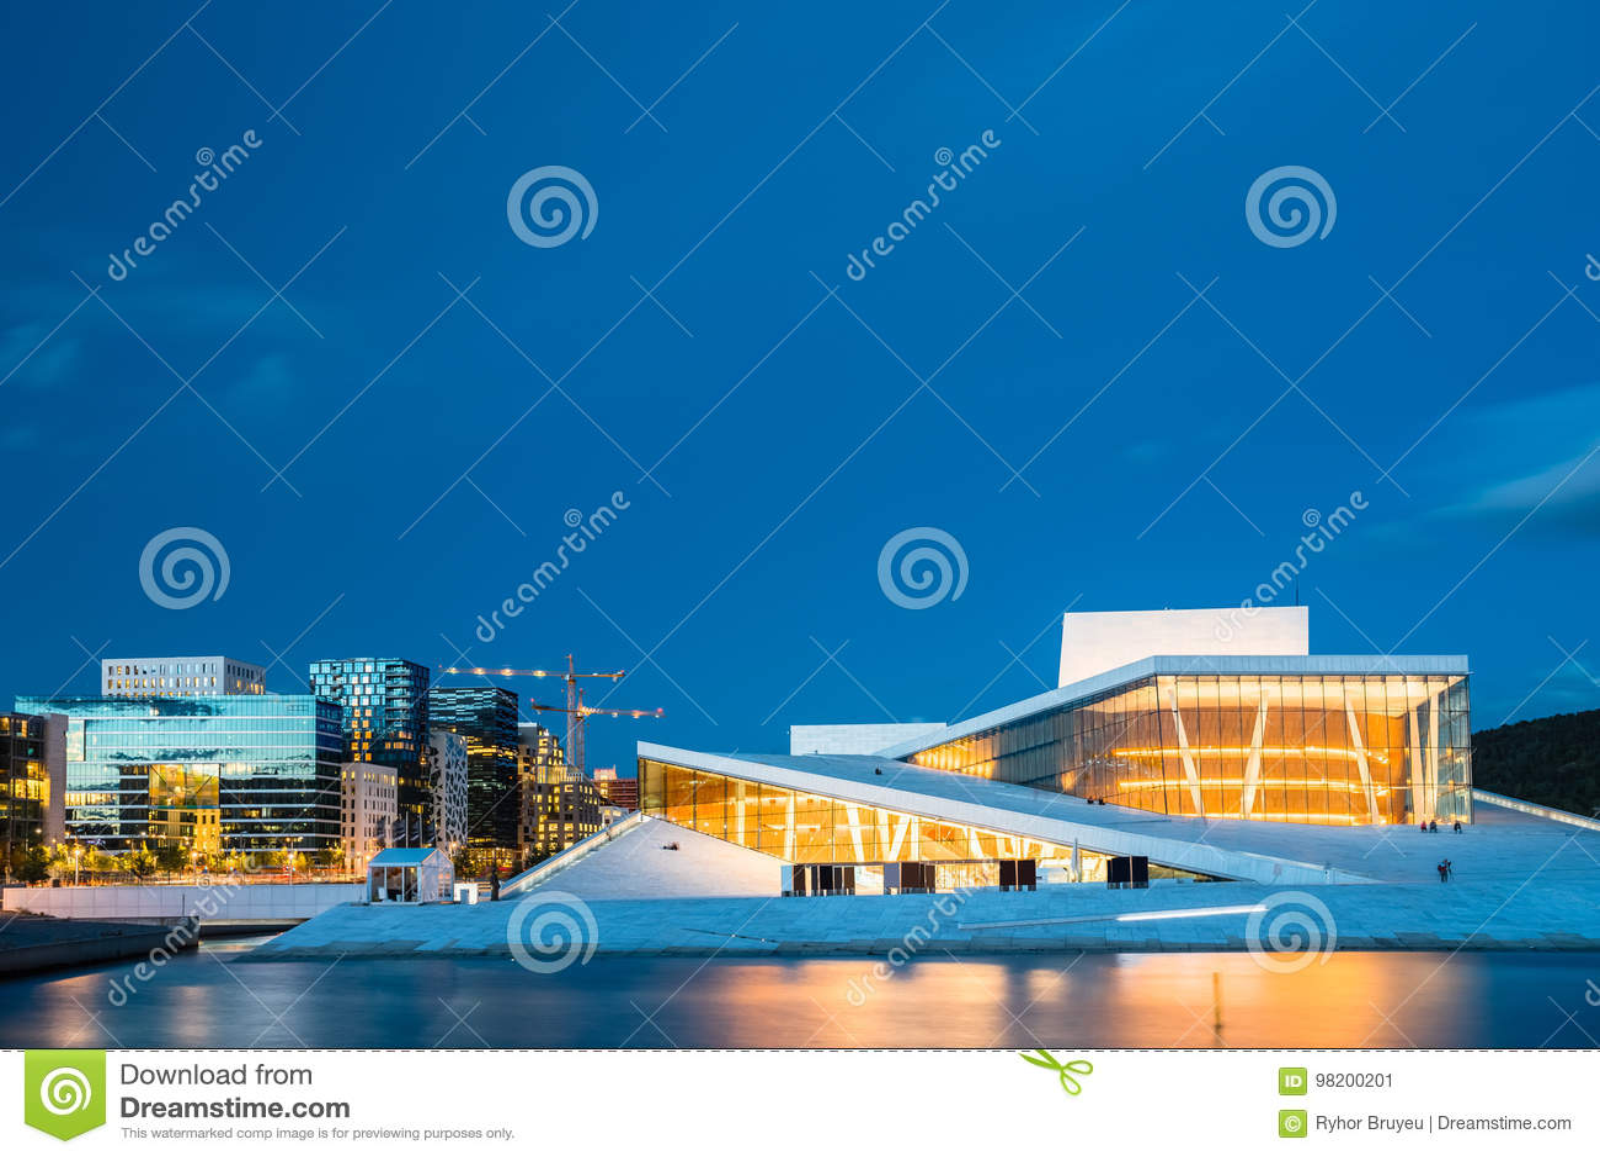 Download Норвегия Осло Взгляд вечера загоренного дома балета оперы среди Стоковое Изображение - изображение насчитывающей ноча, дом: 98200201